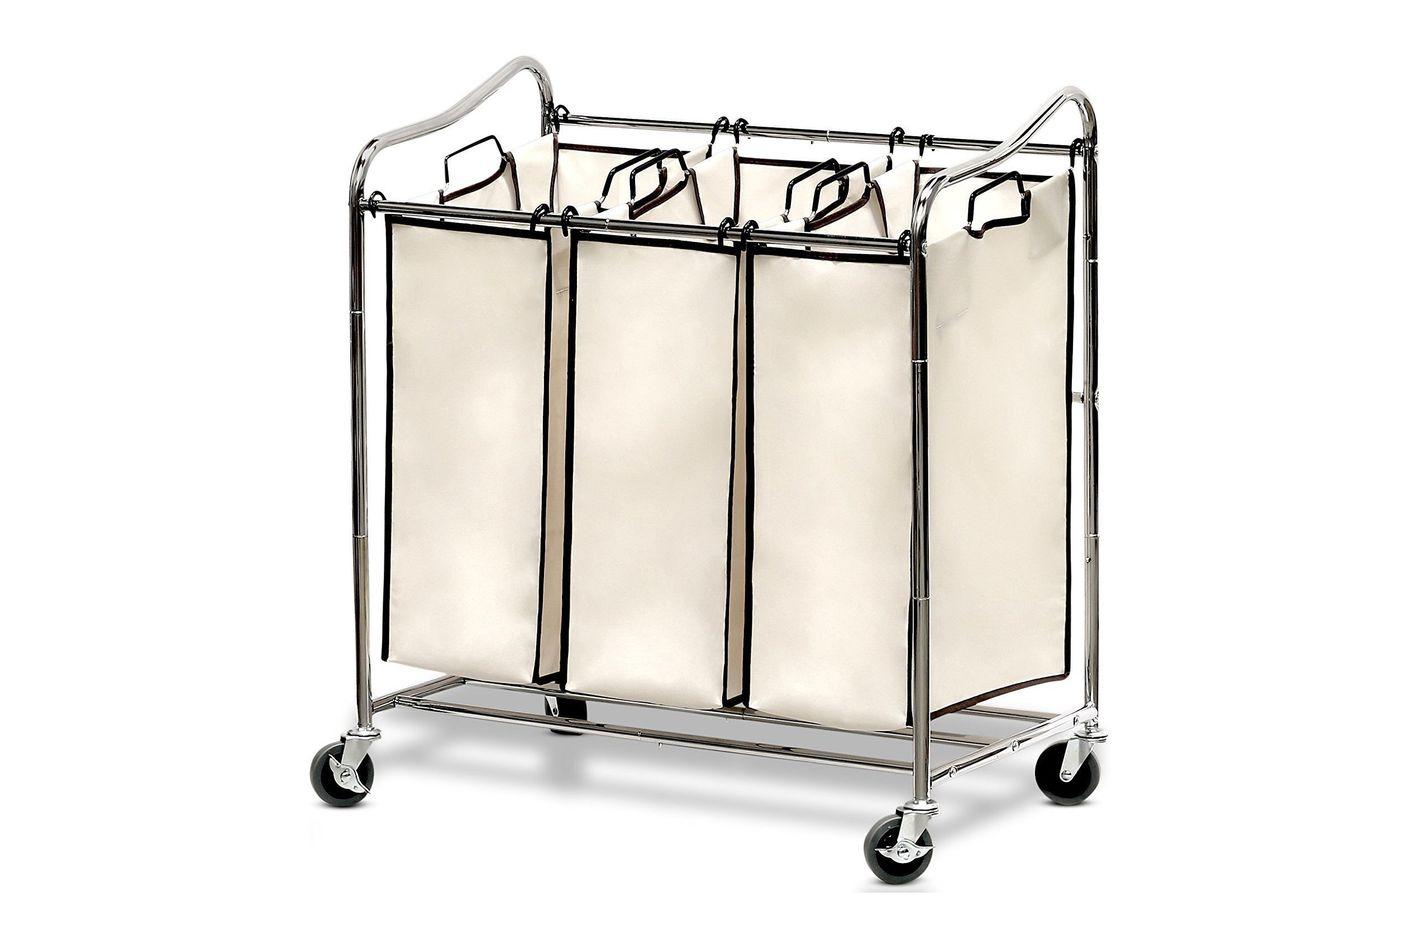 Simple Houseware Heavy-Duty 3-Bag Laundry Sorter